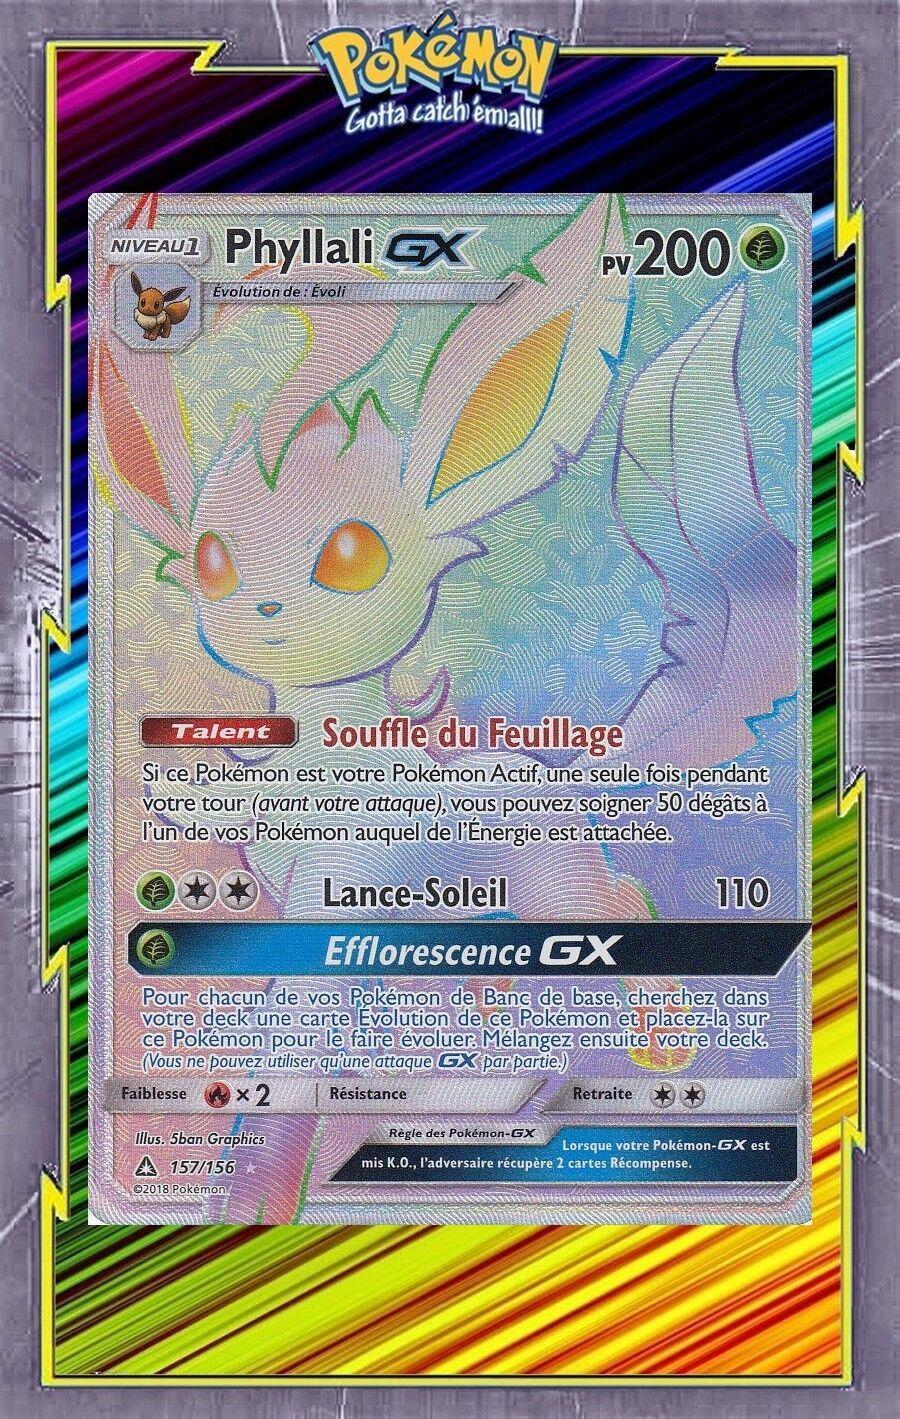 Phyllali gx - geheimnis - sl05  ultra - prisme - 157   156 - carte pokemon - fran ç aise